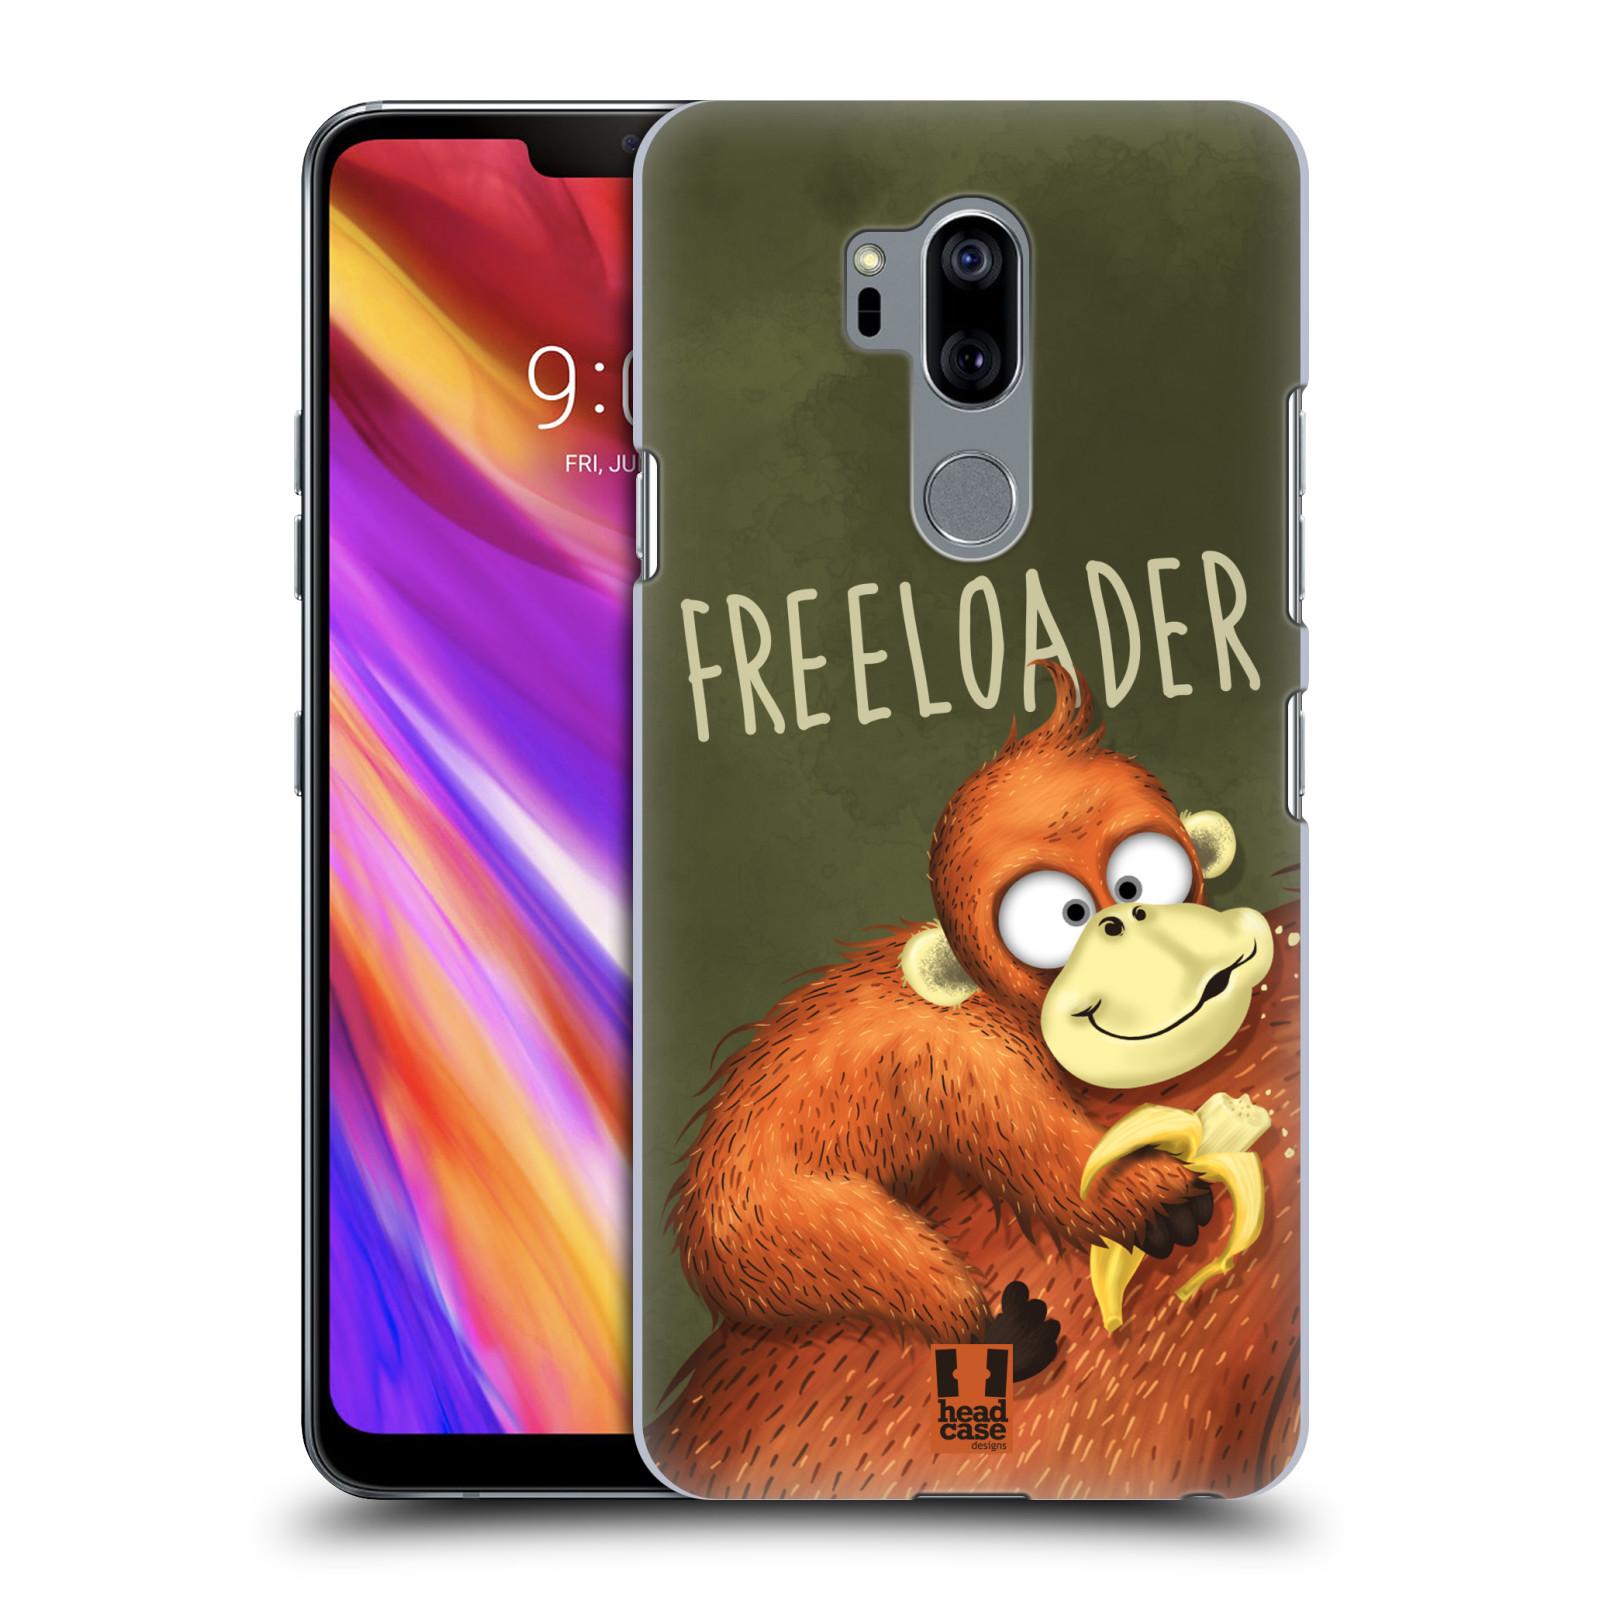 Plastové pouzdro na mobil LG G7 ThinQ - Head Case - Opičák Freeloader